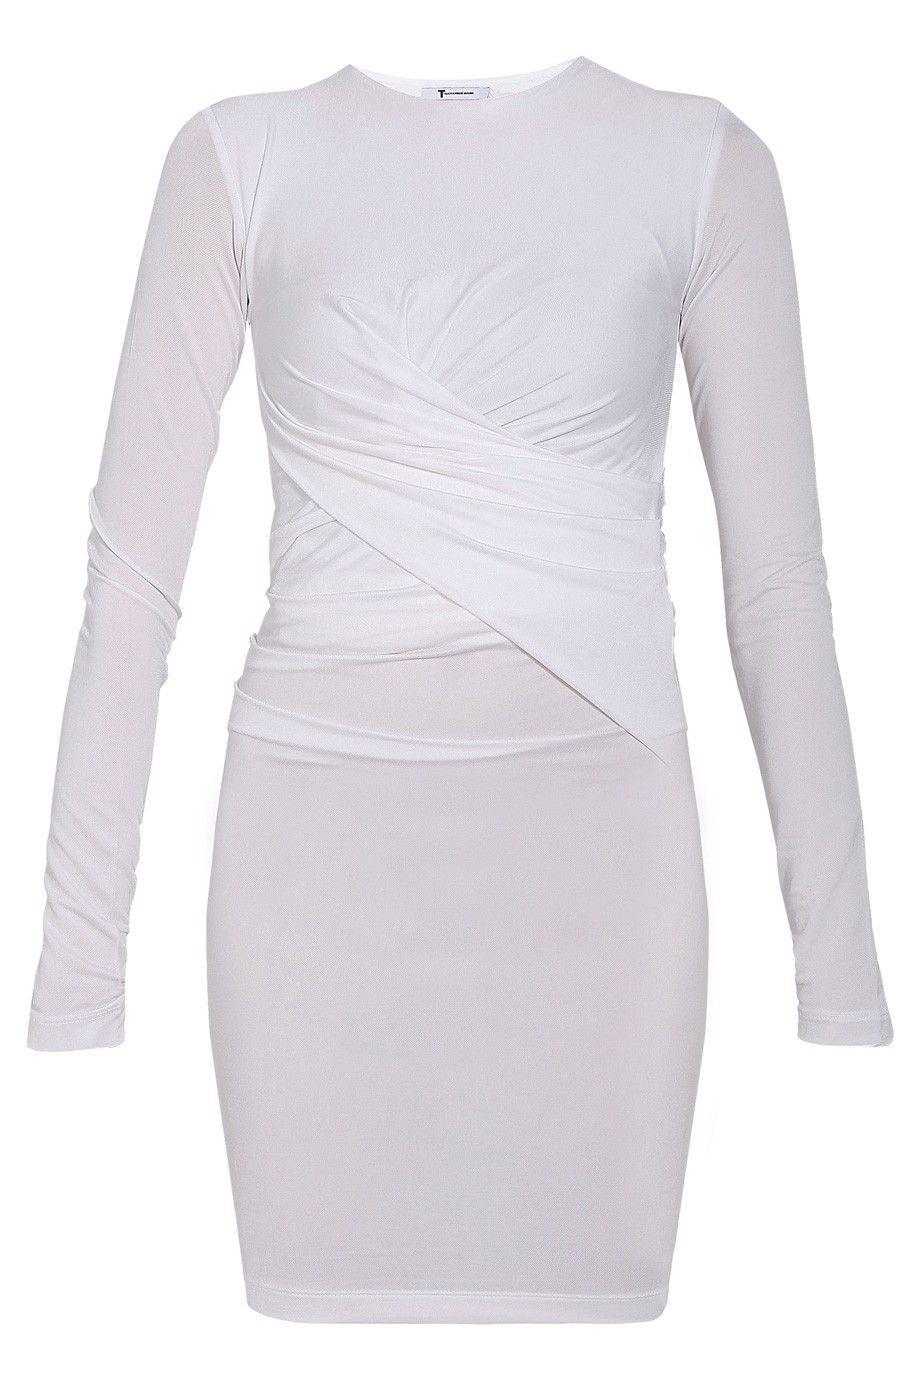 Pique Mesh Twist Dress By T BY ALEXANDER WANG @ http://www.boutique1.com/